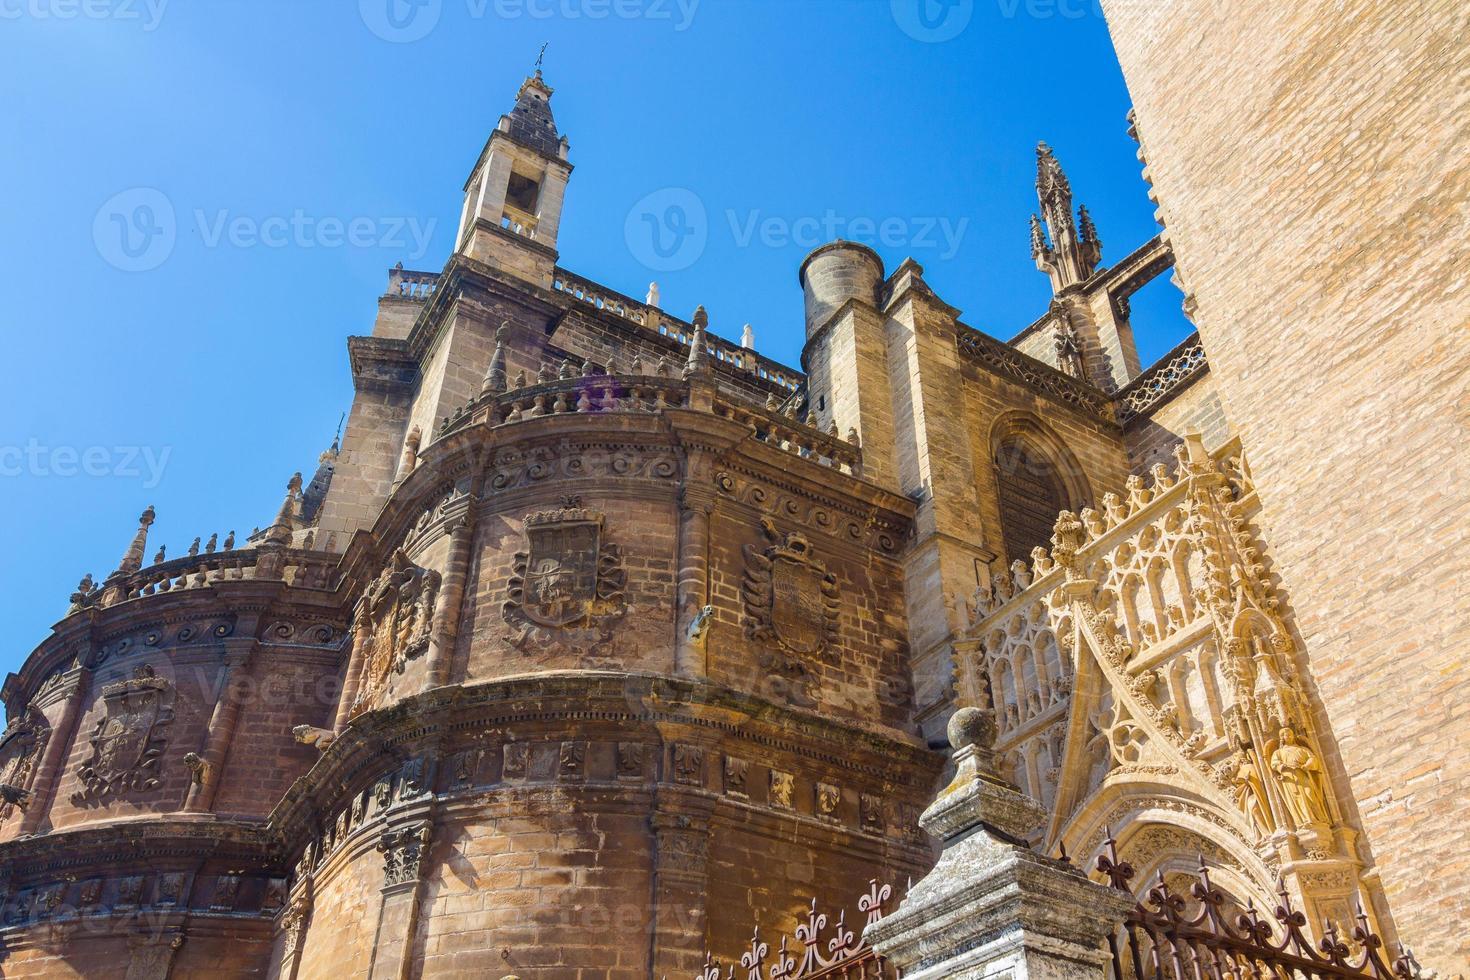 Détails de la façade la cathédrale santa maria la giralda photo